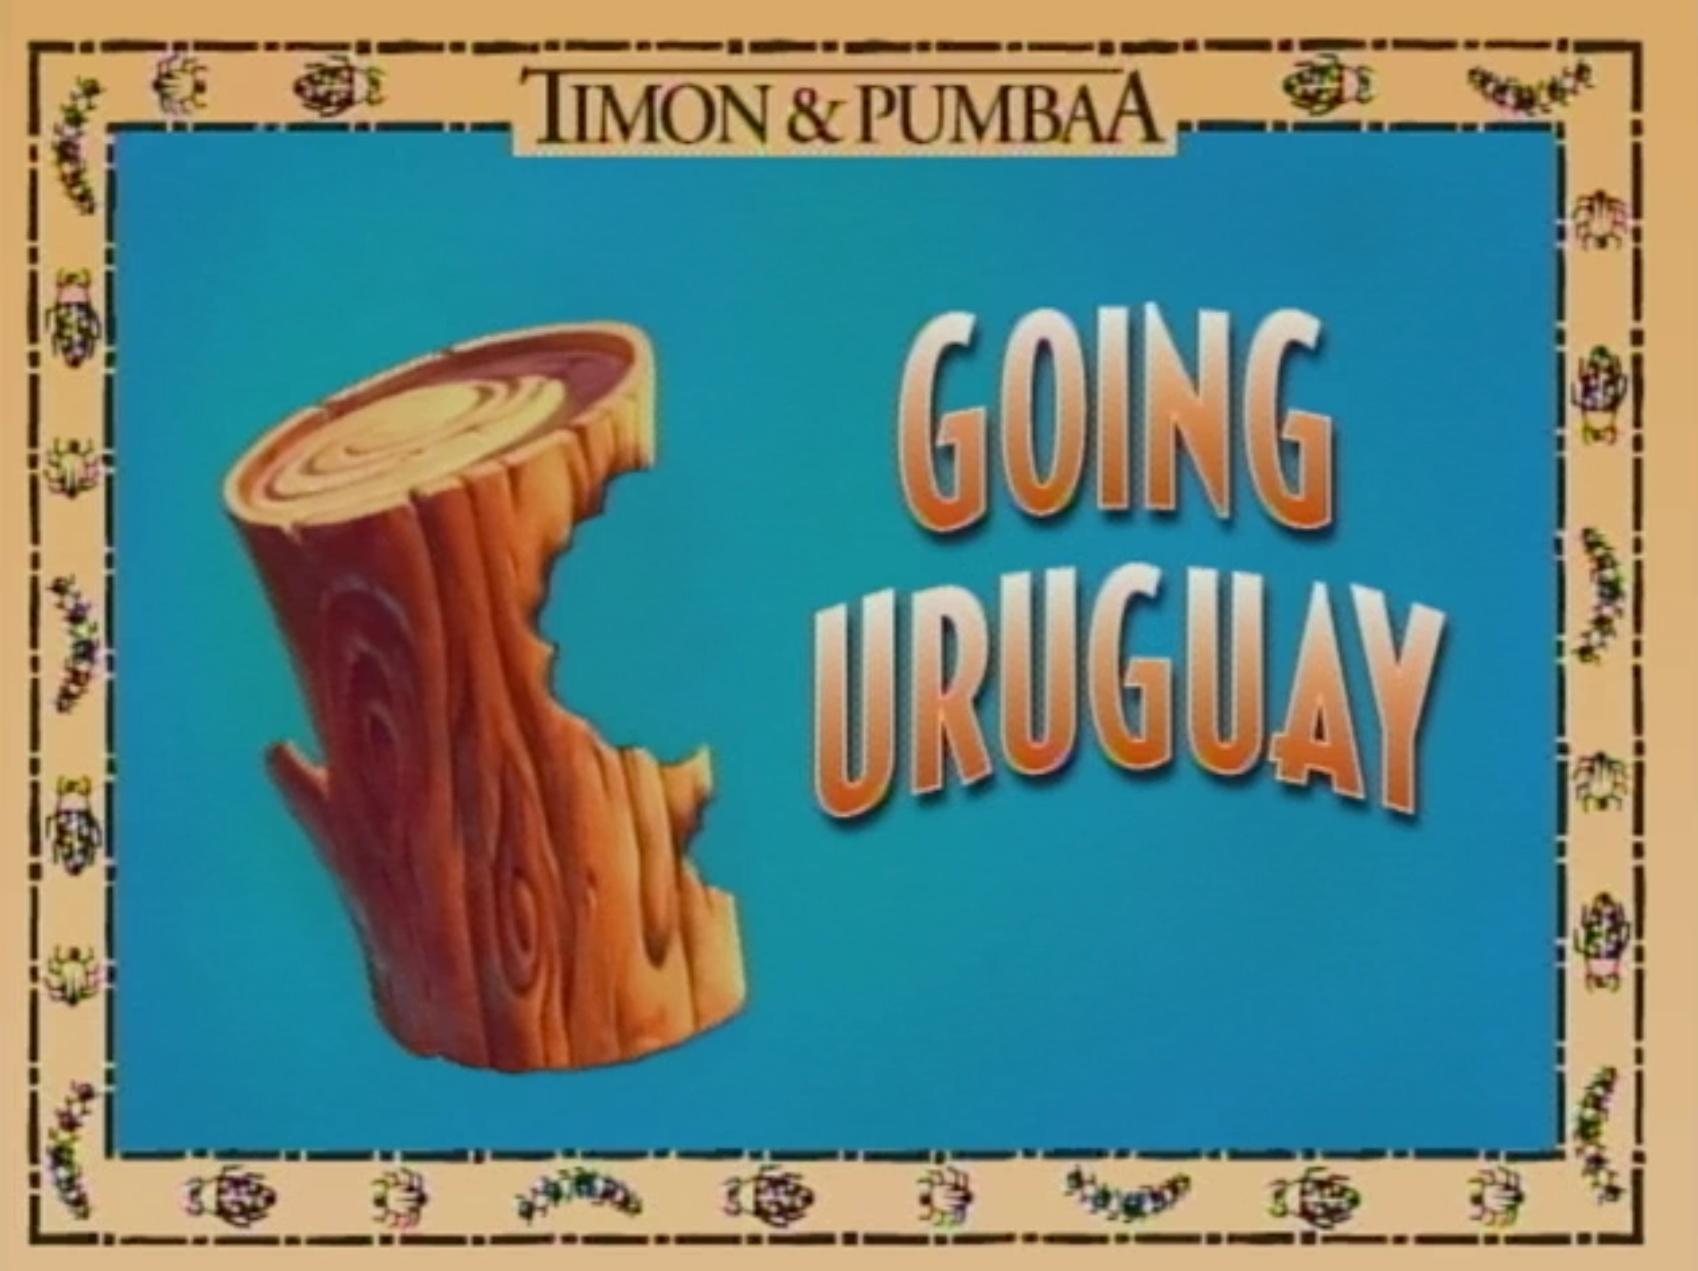 Going Uruguay